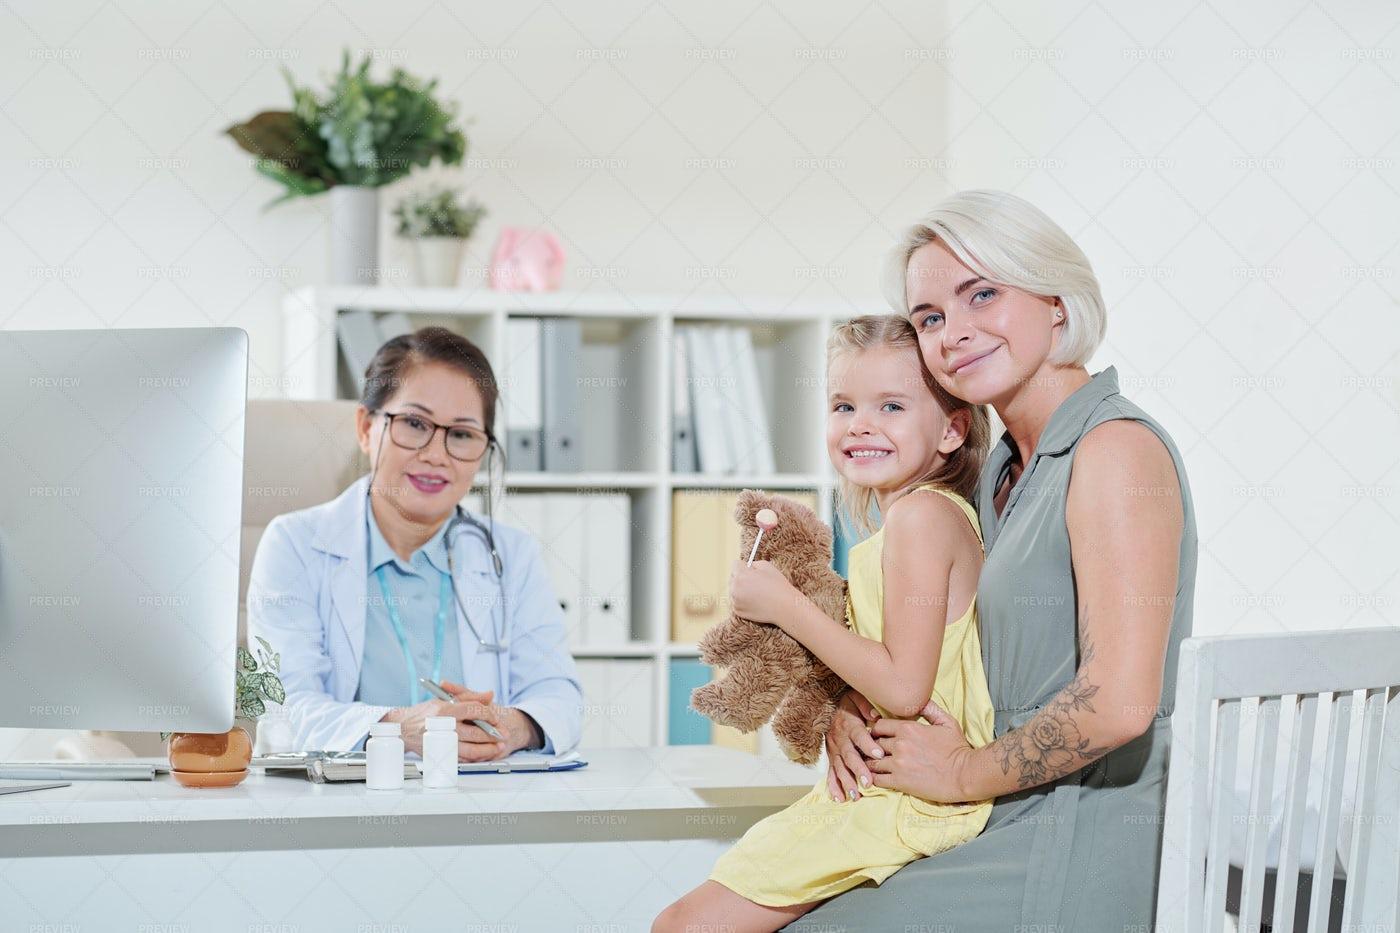 Mom And Daughter Visiting A Pediatrician: Stock Photos